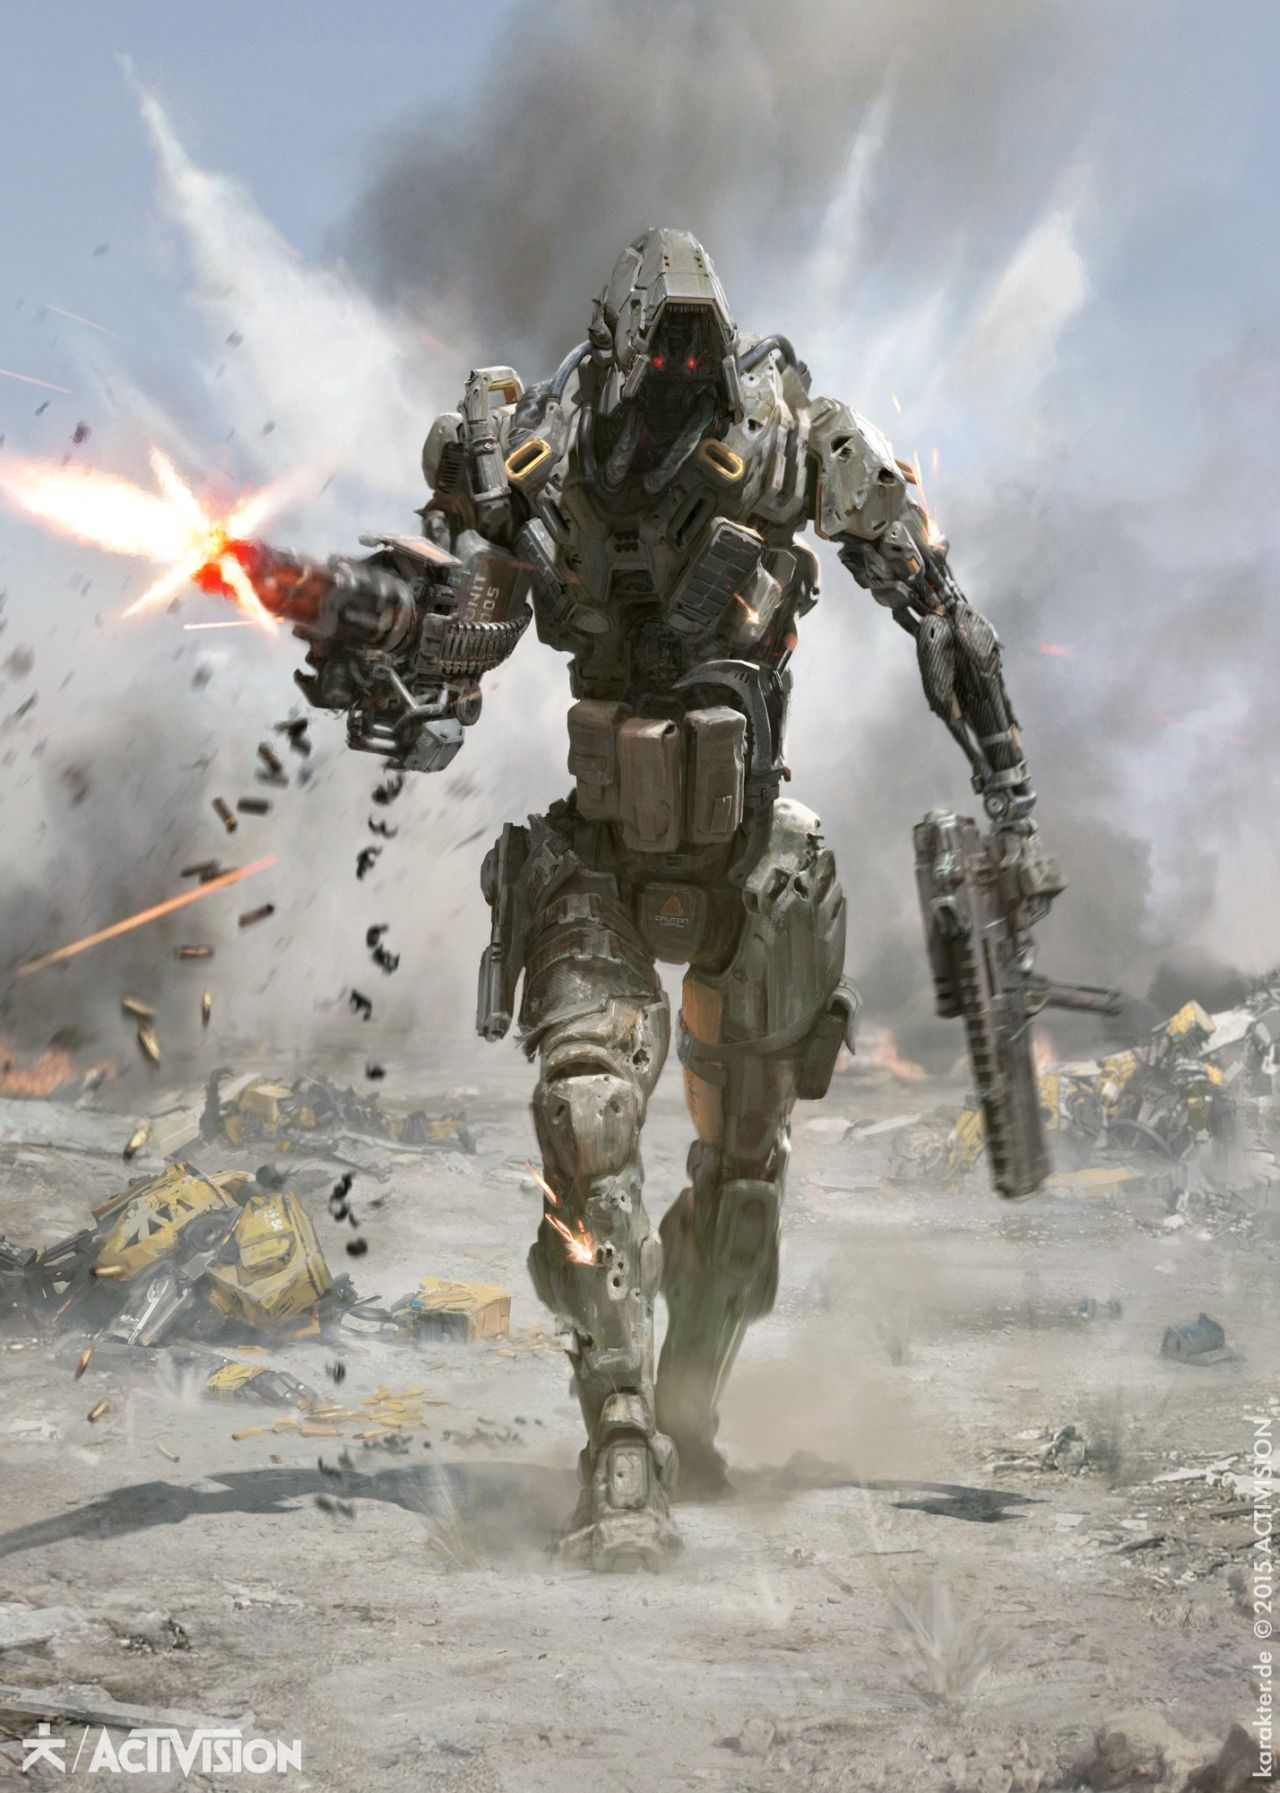 Manof2moro Call Of Duty Black Ops 3 Call Of Duty Call Of Duty